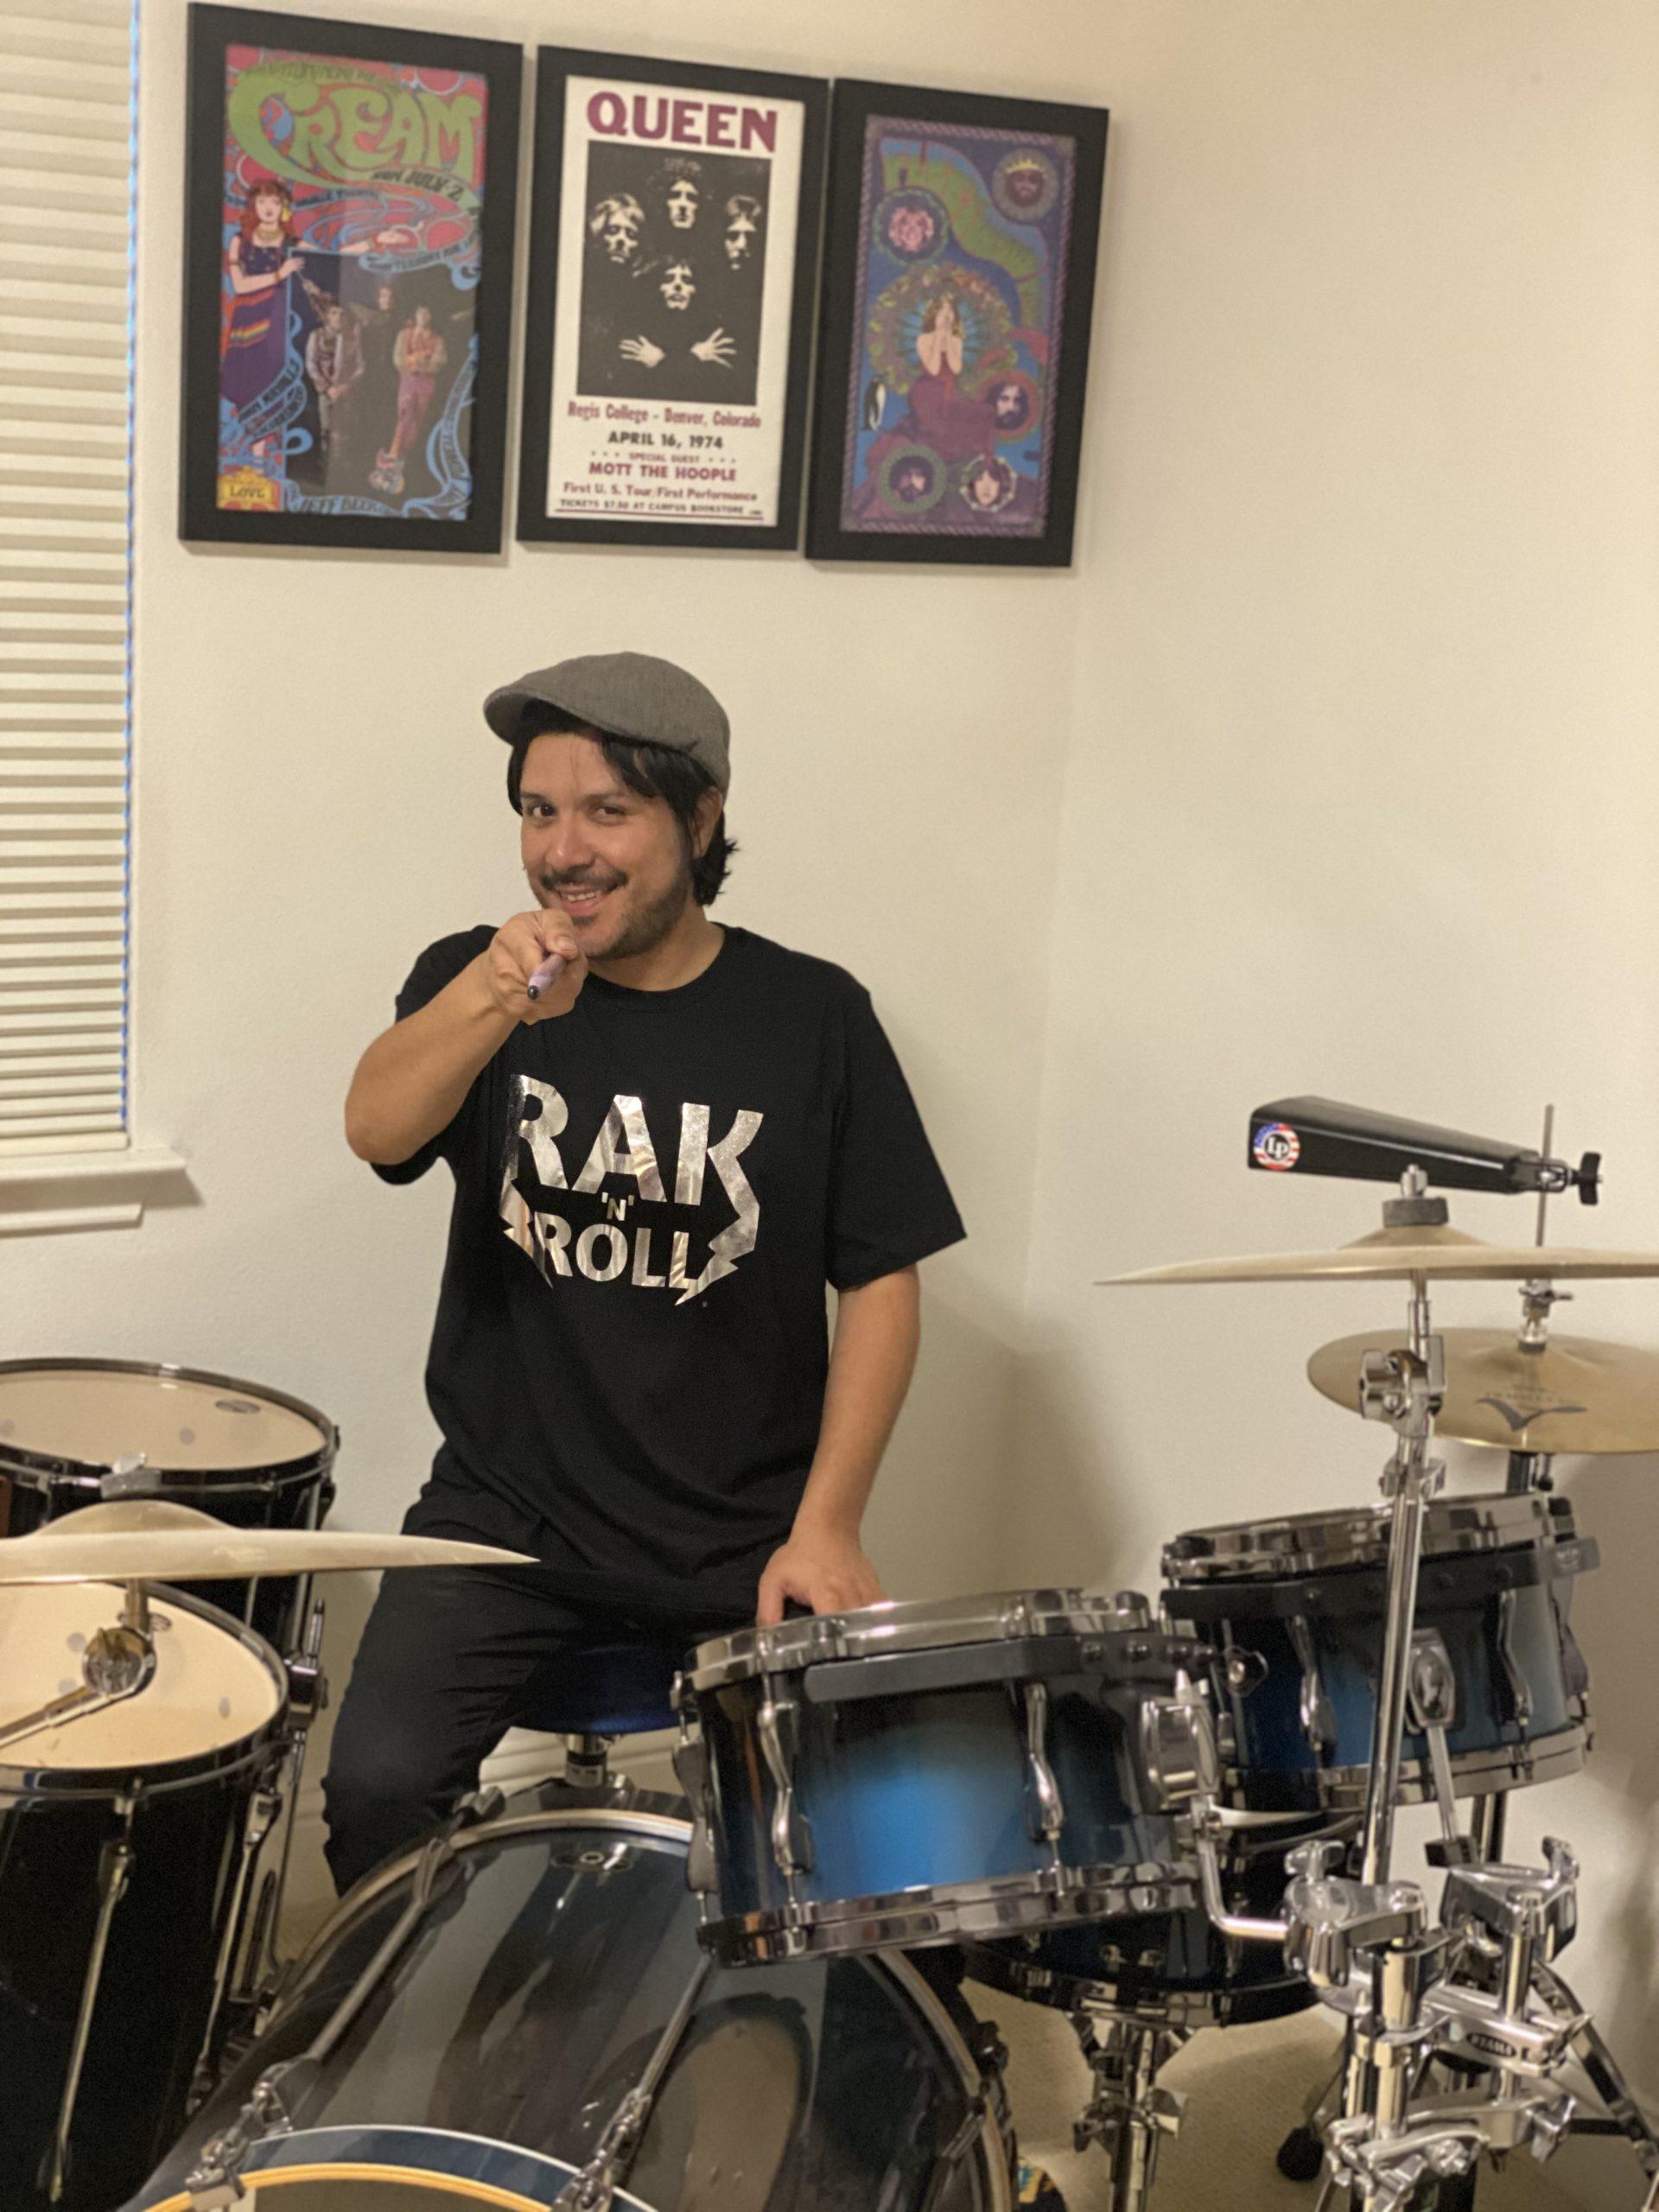 rak 'n' roll t-shirt with drum set